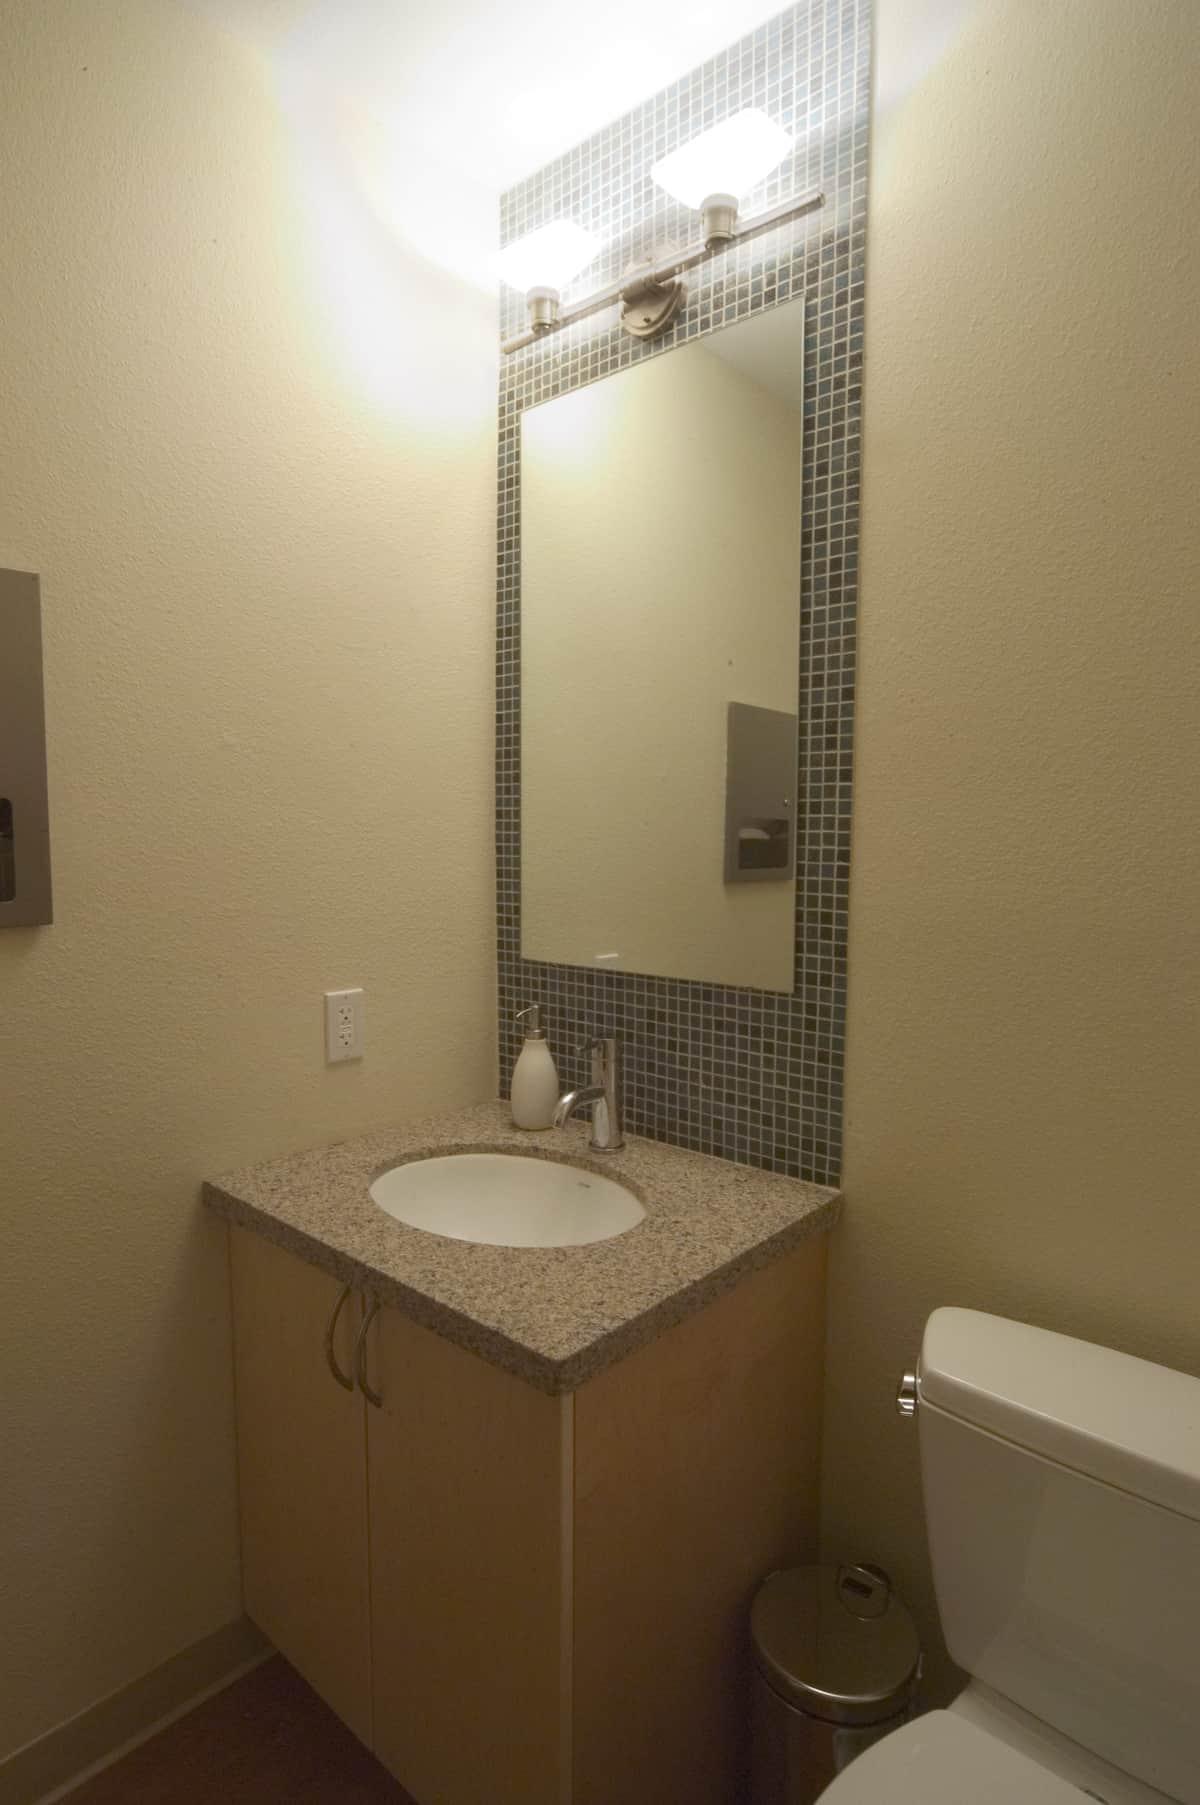 stylish customer's toilet